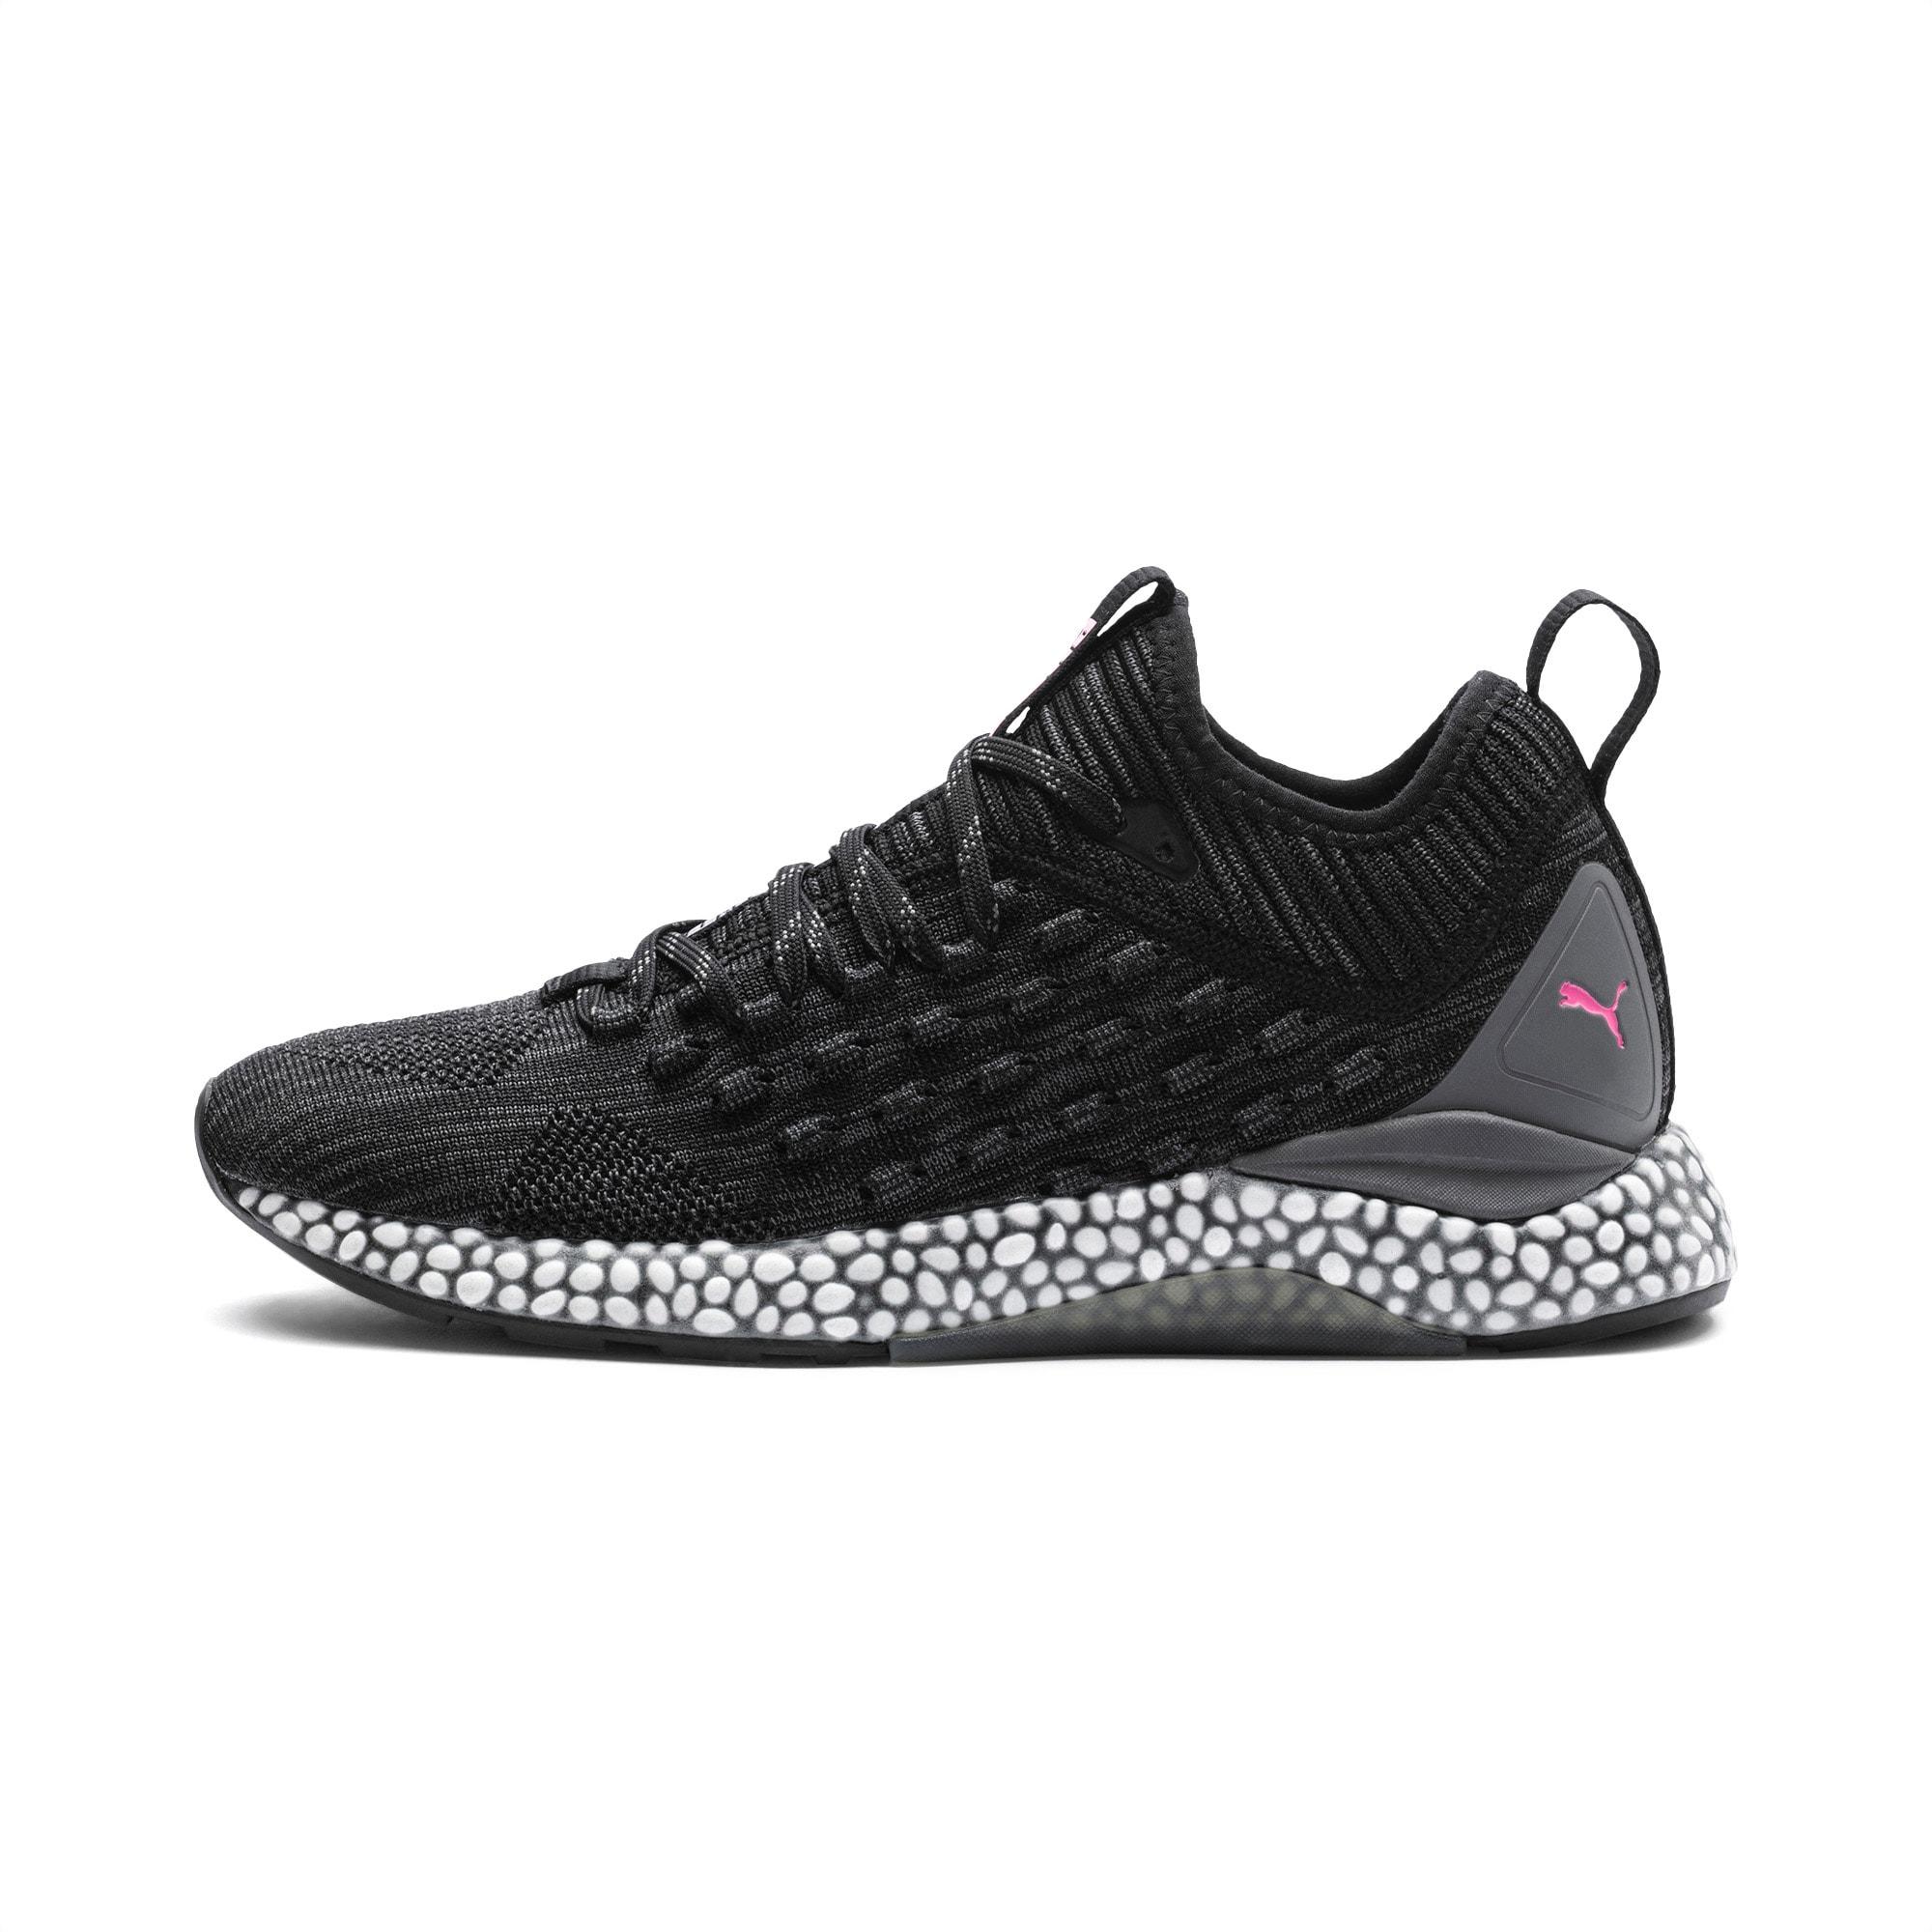 puma hybrid runner shoes